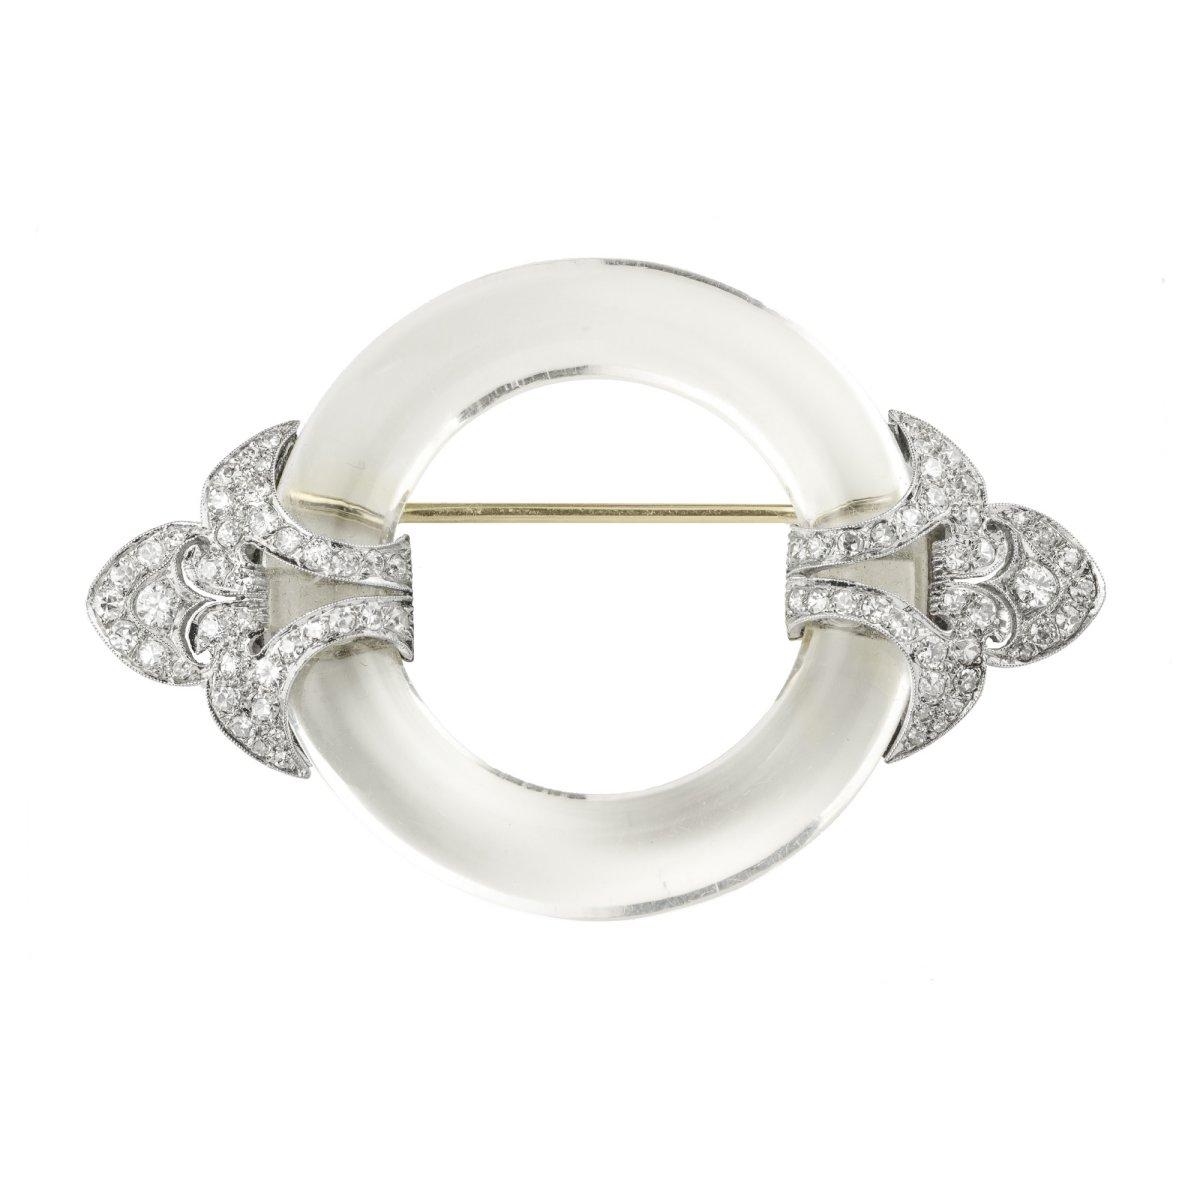 A diamond and rock crystal brooch, ca. 1925